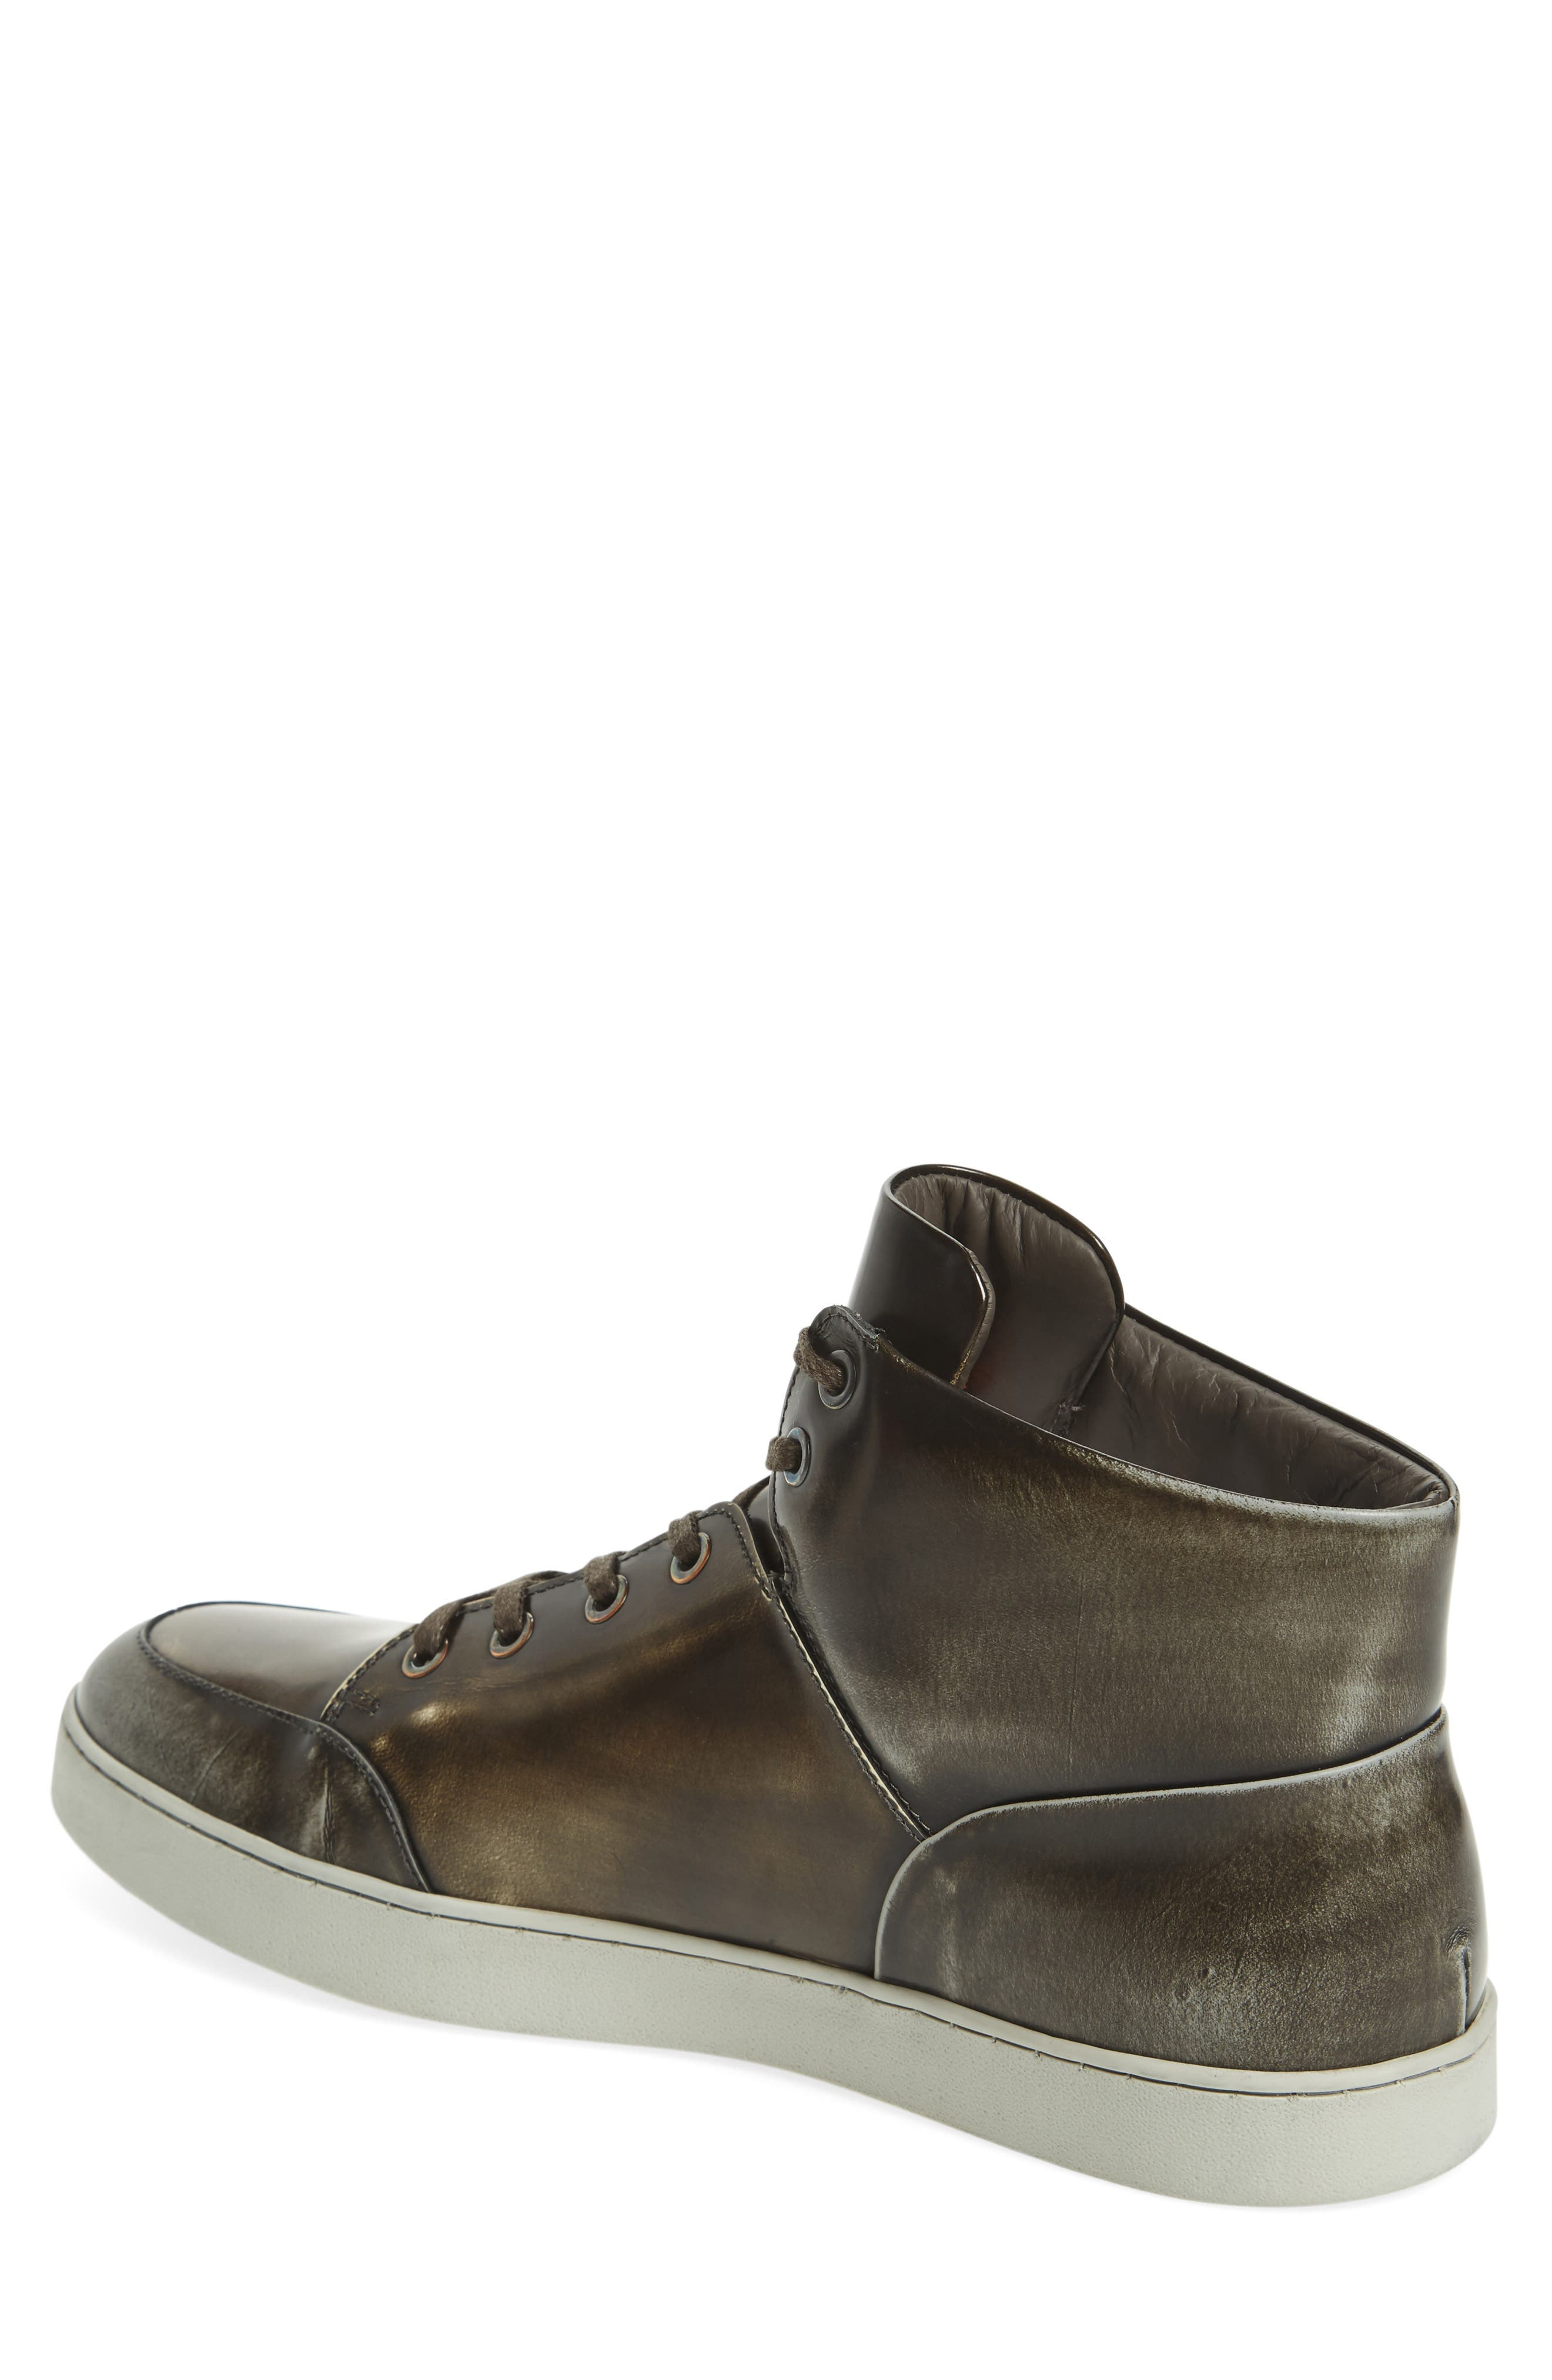 Gidean High Top Sneaker,                             Alternate thumbnail 3, color,